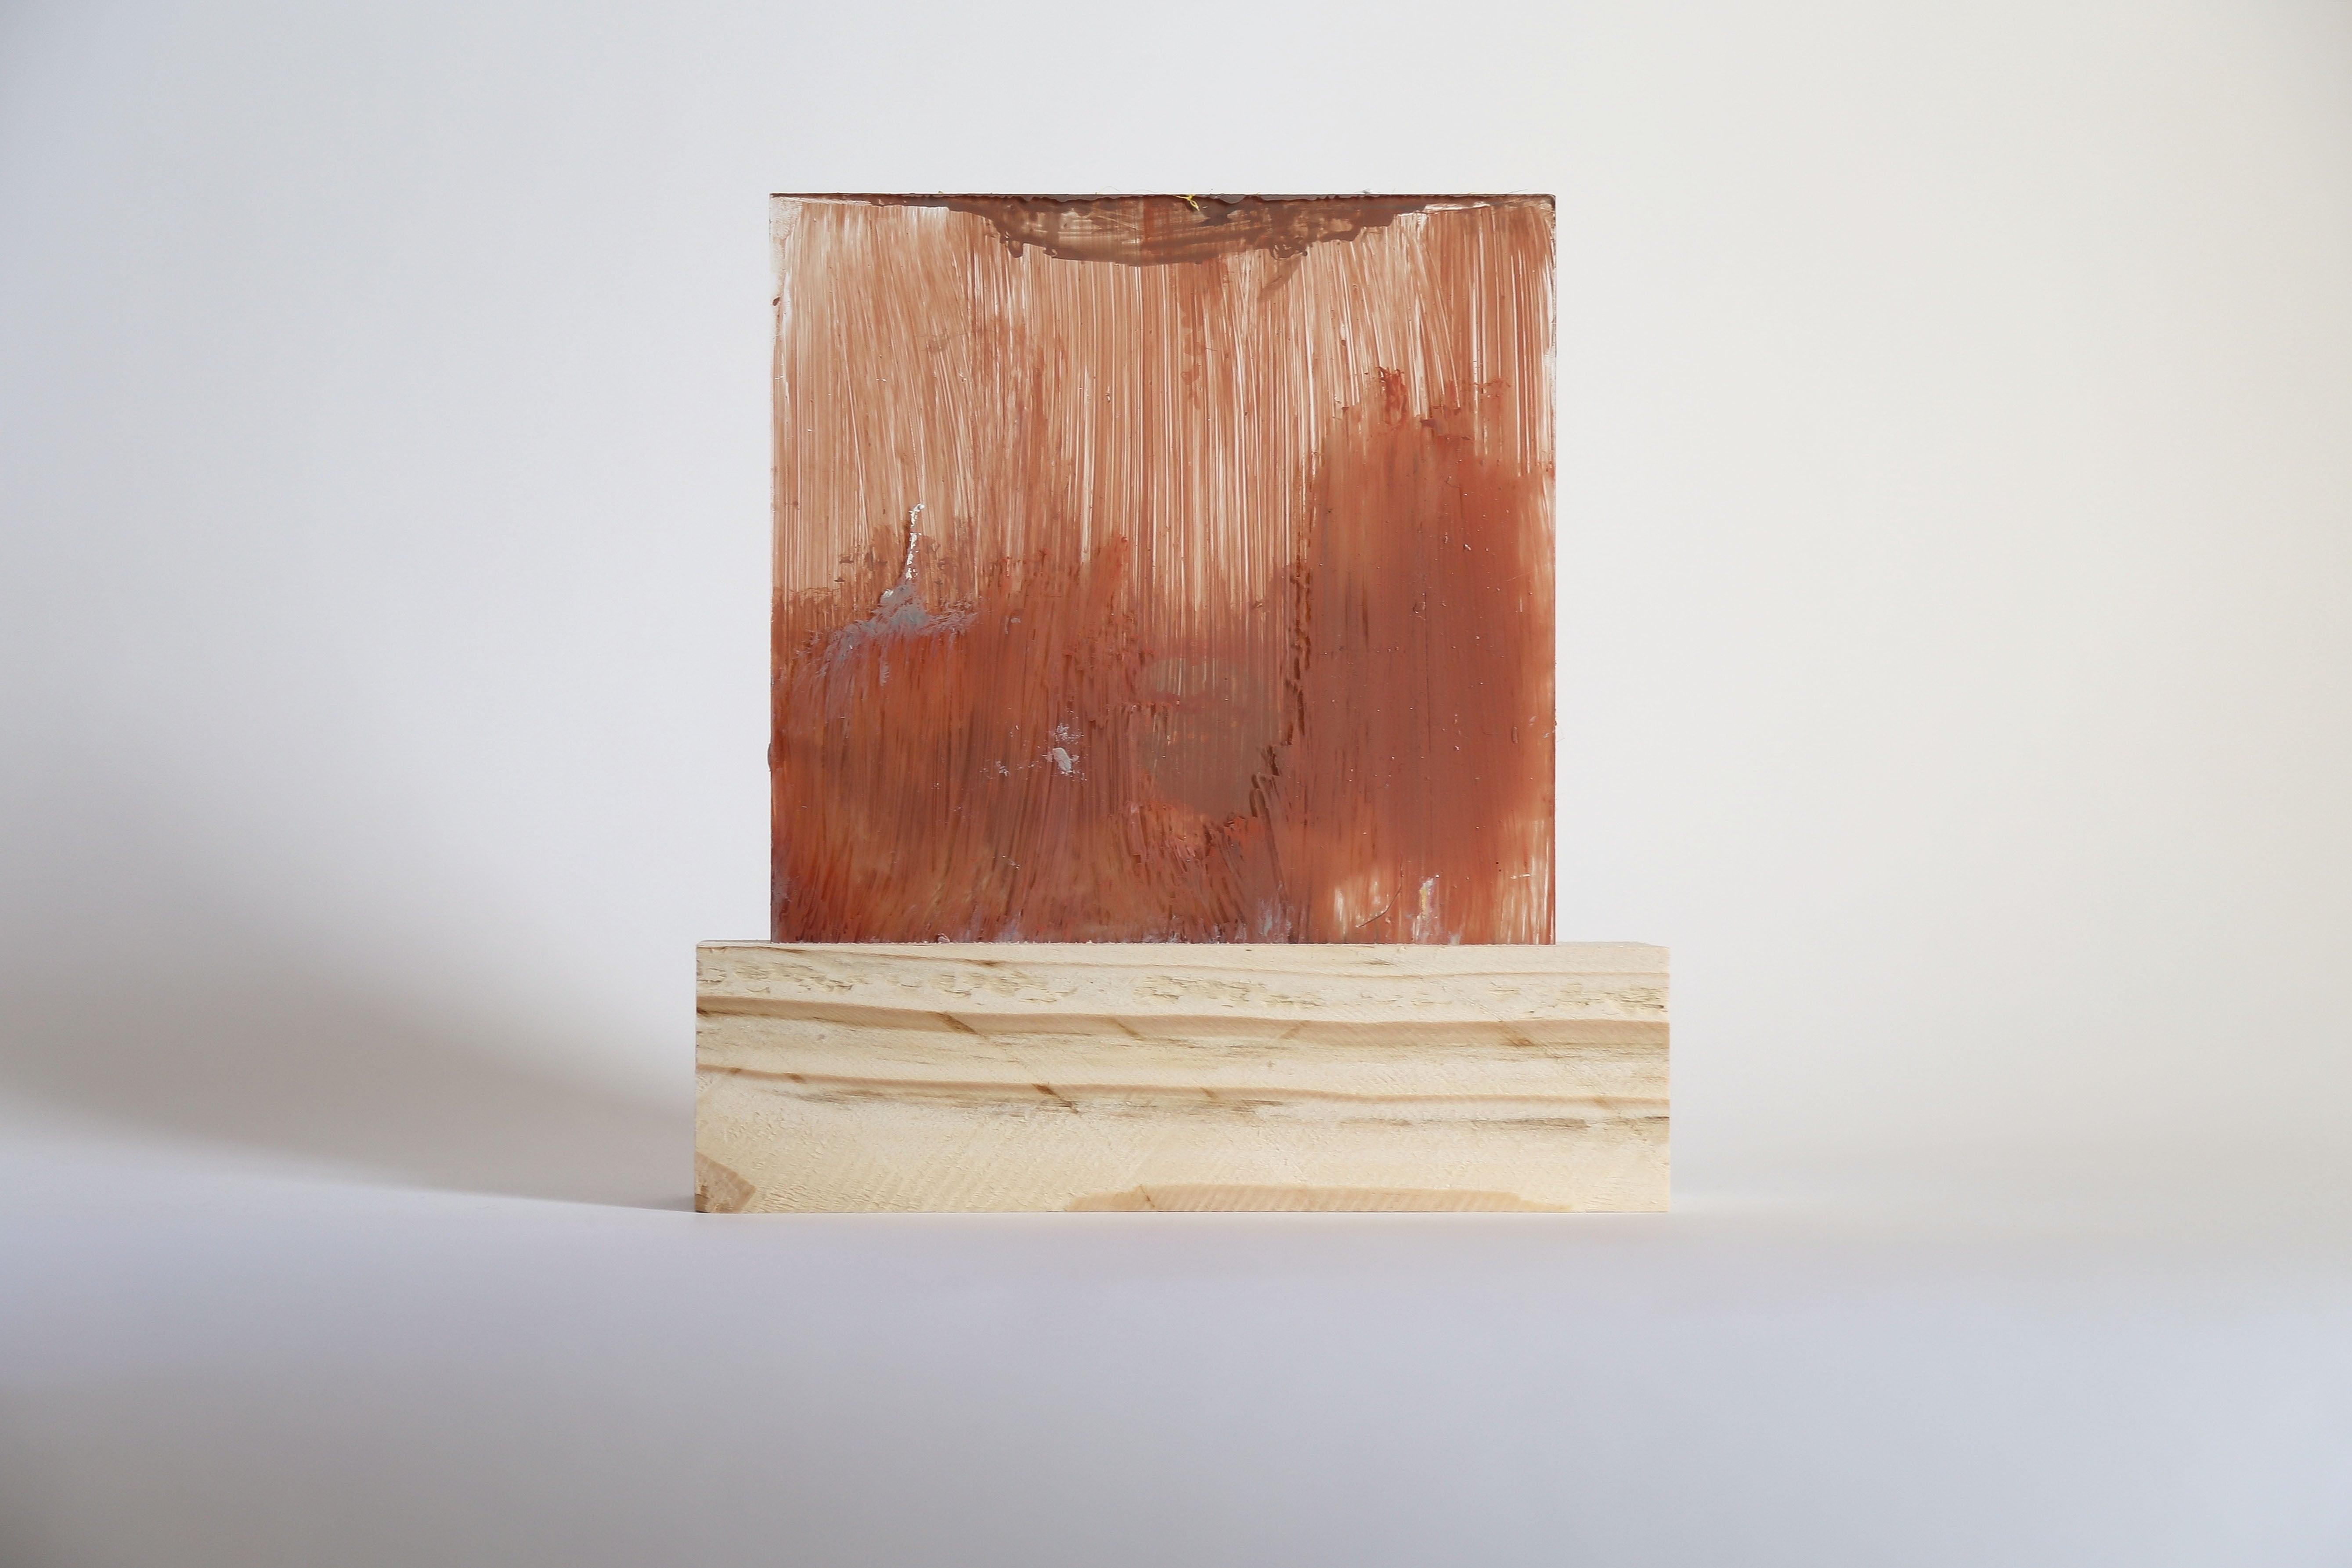 Lourdes Rivera, Retrospect 4, 2015, Plexiglass, Wood, Oil Paint